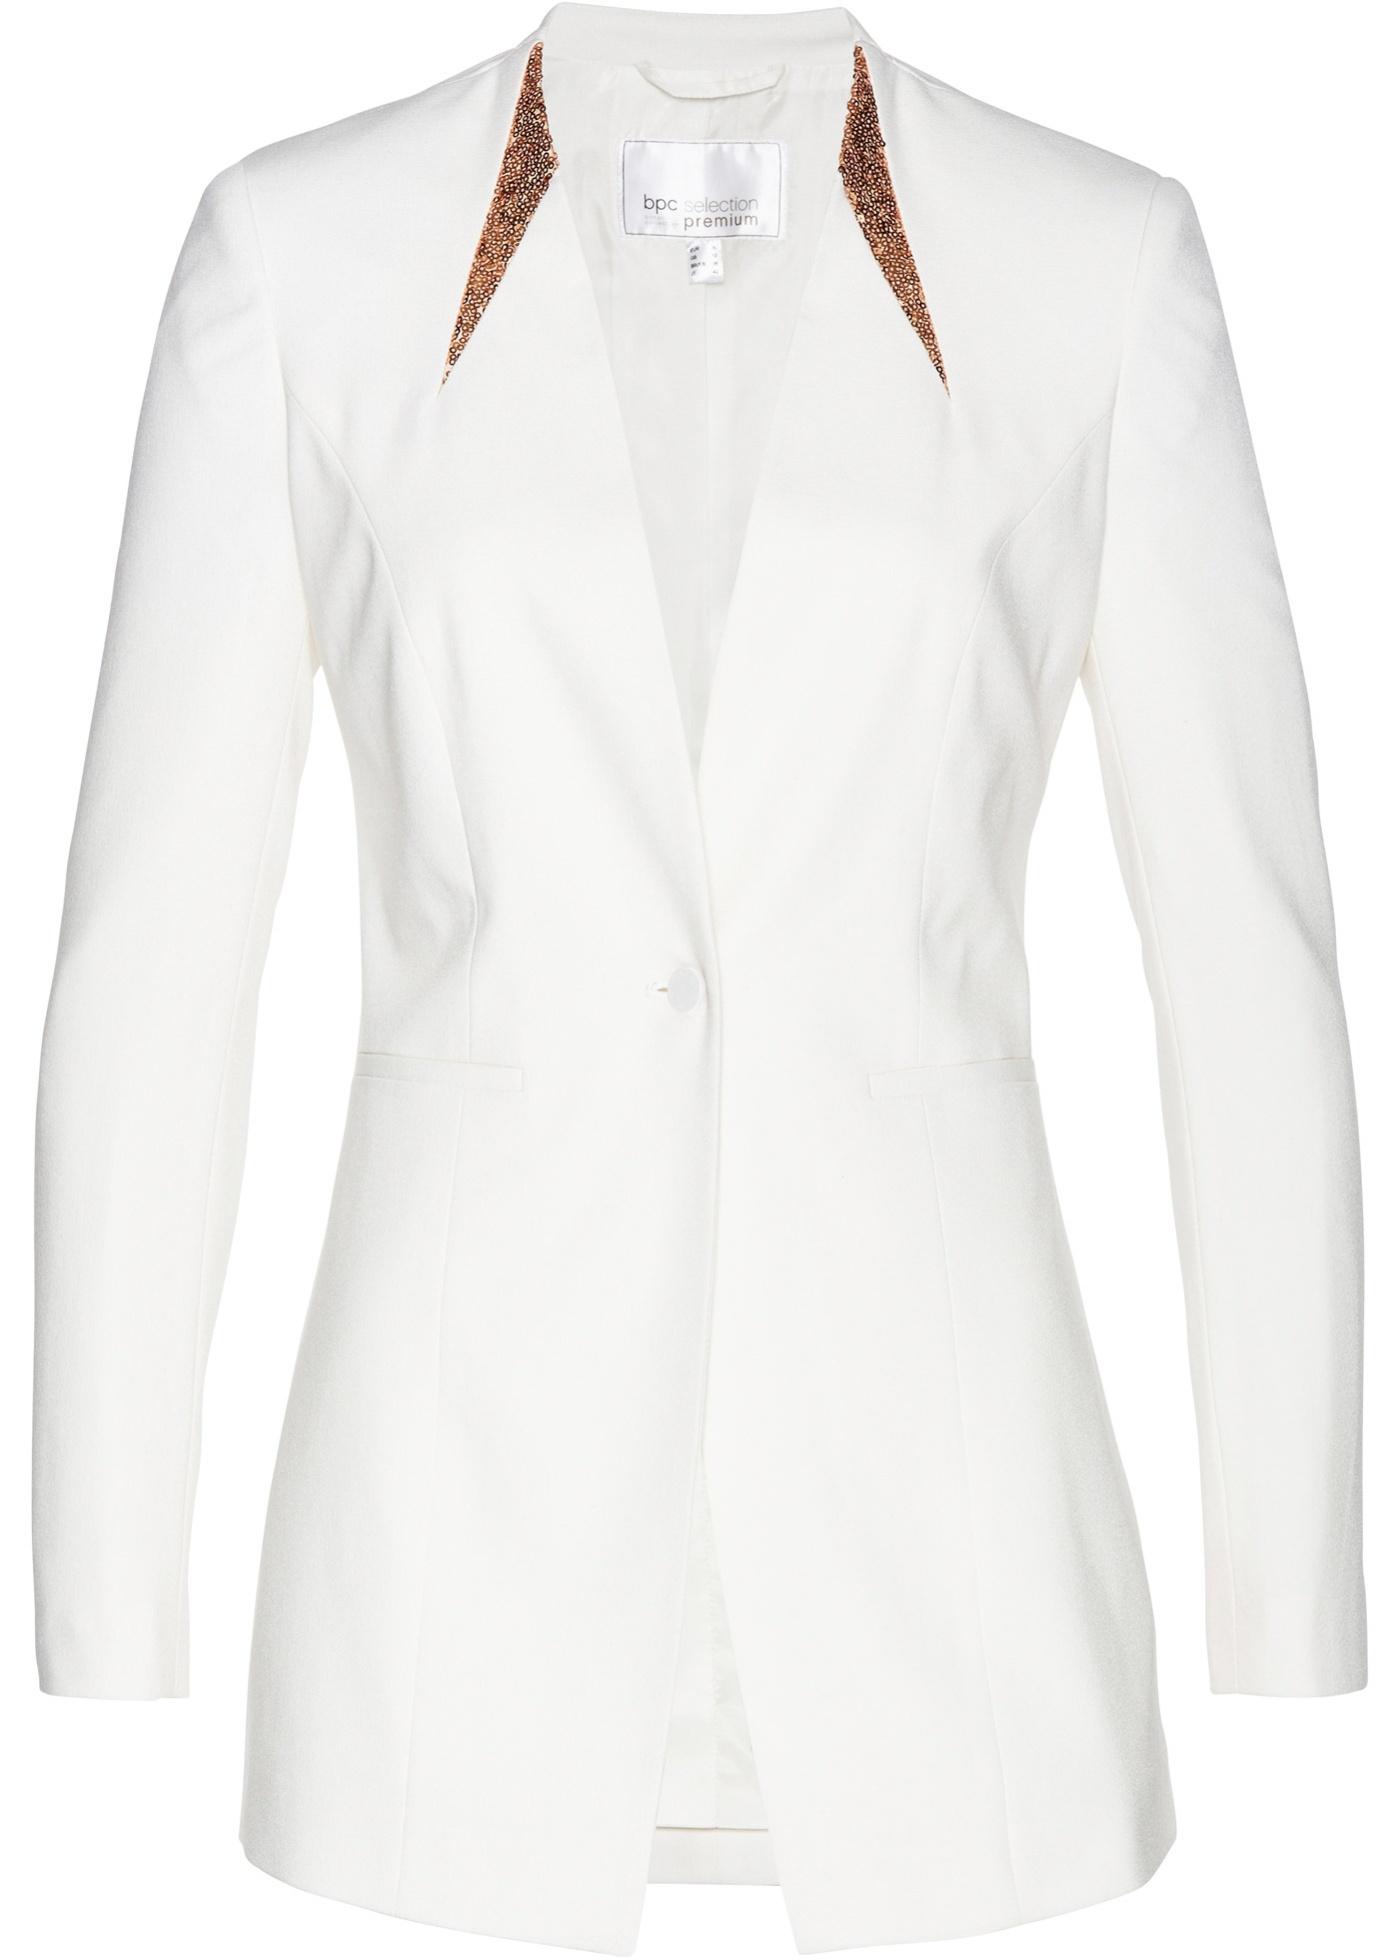 Blazer con paillettes (Bianco) - bpc selection premium